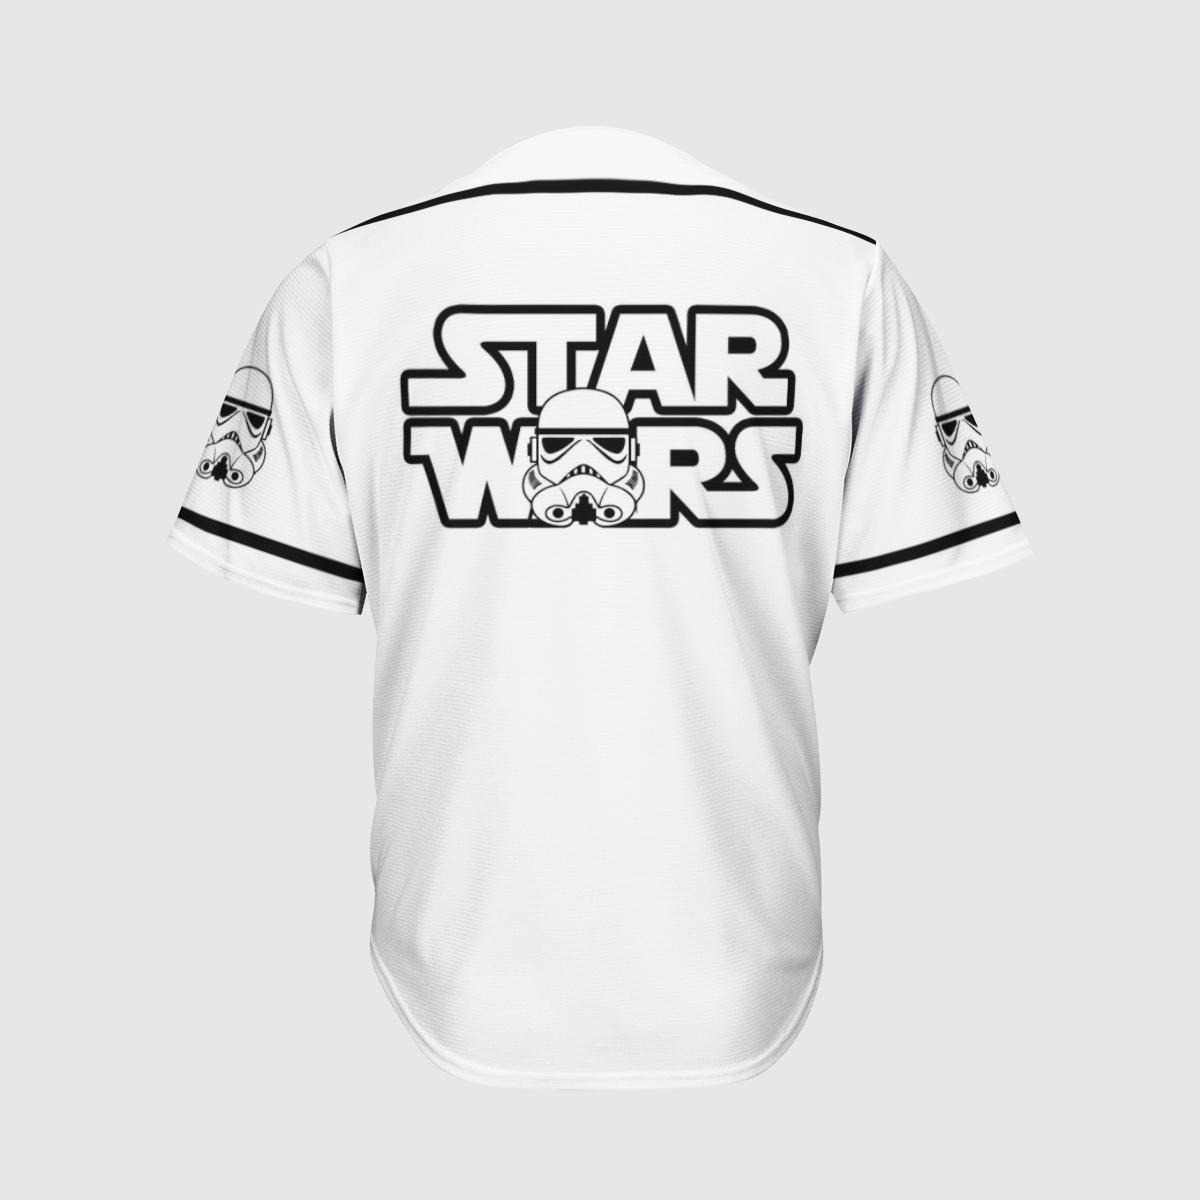 Stormtrooper Star Wars baseball shirt 1